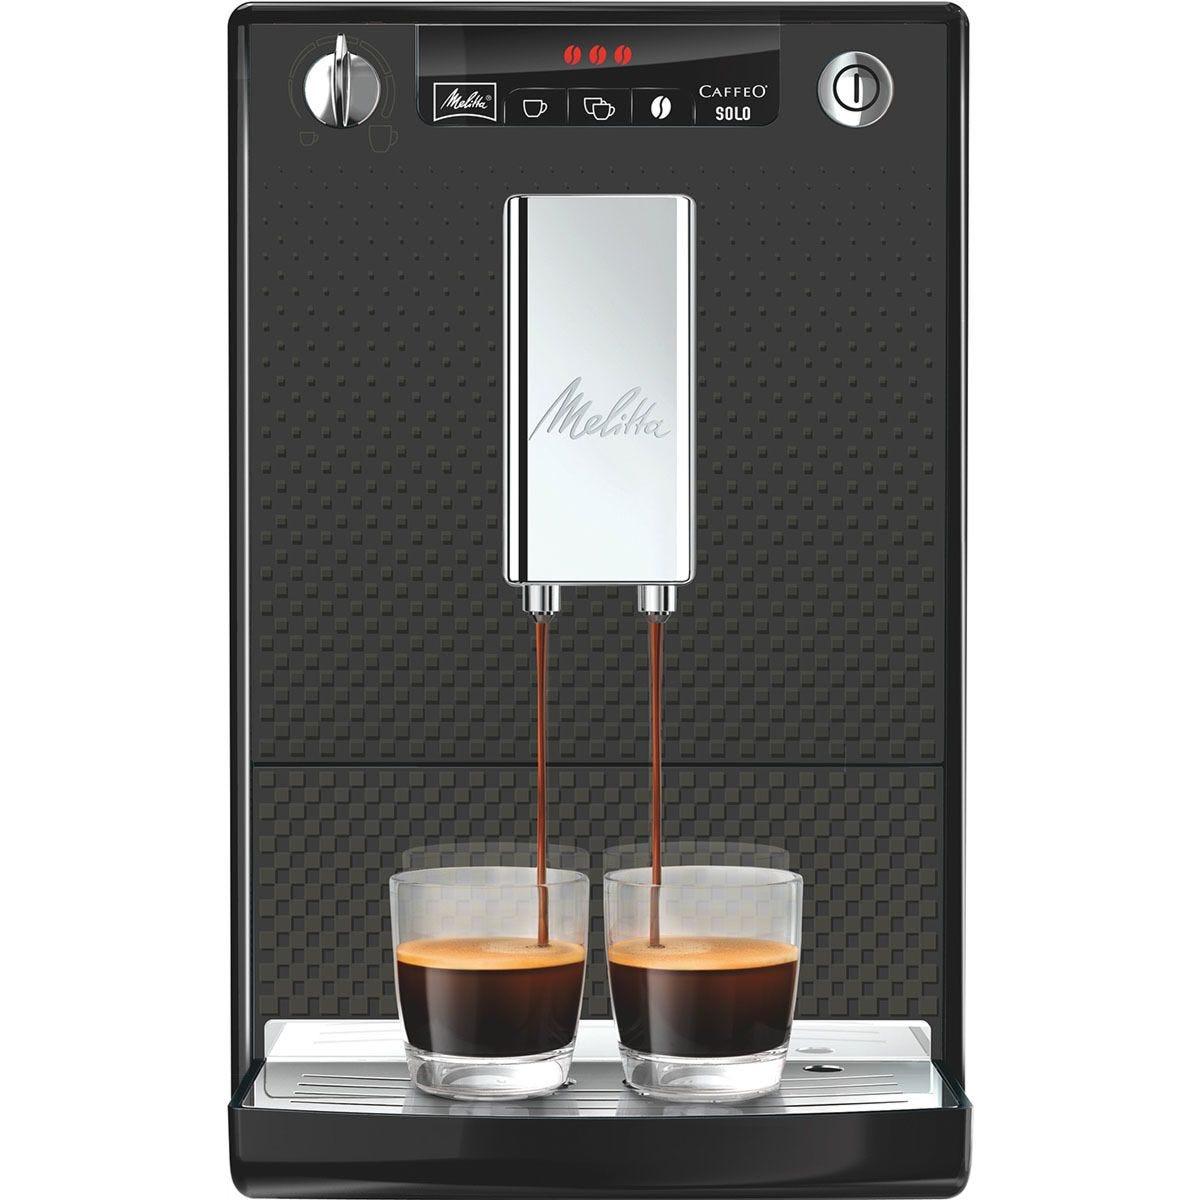 Melitta 6708696 Caffeo Solo Full Automatic Bean to Cup Coffee Machine – Black